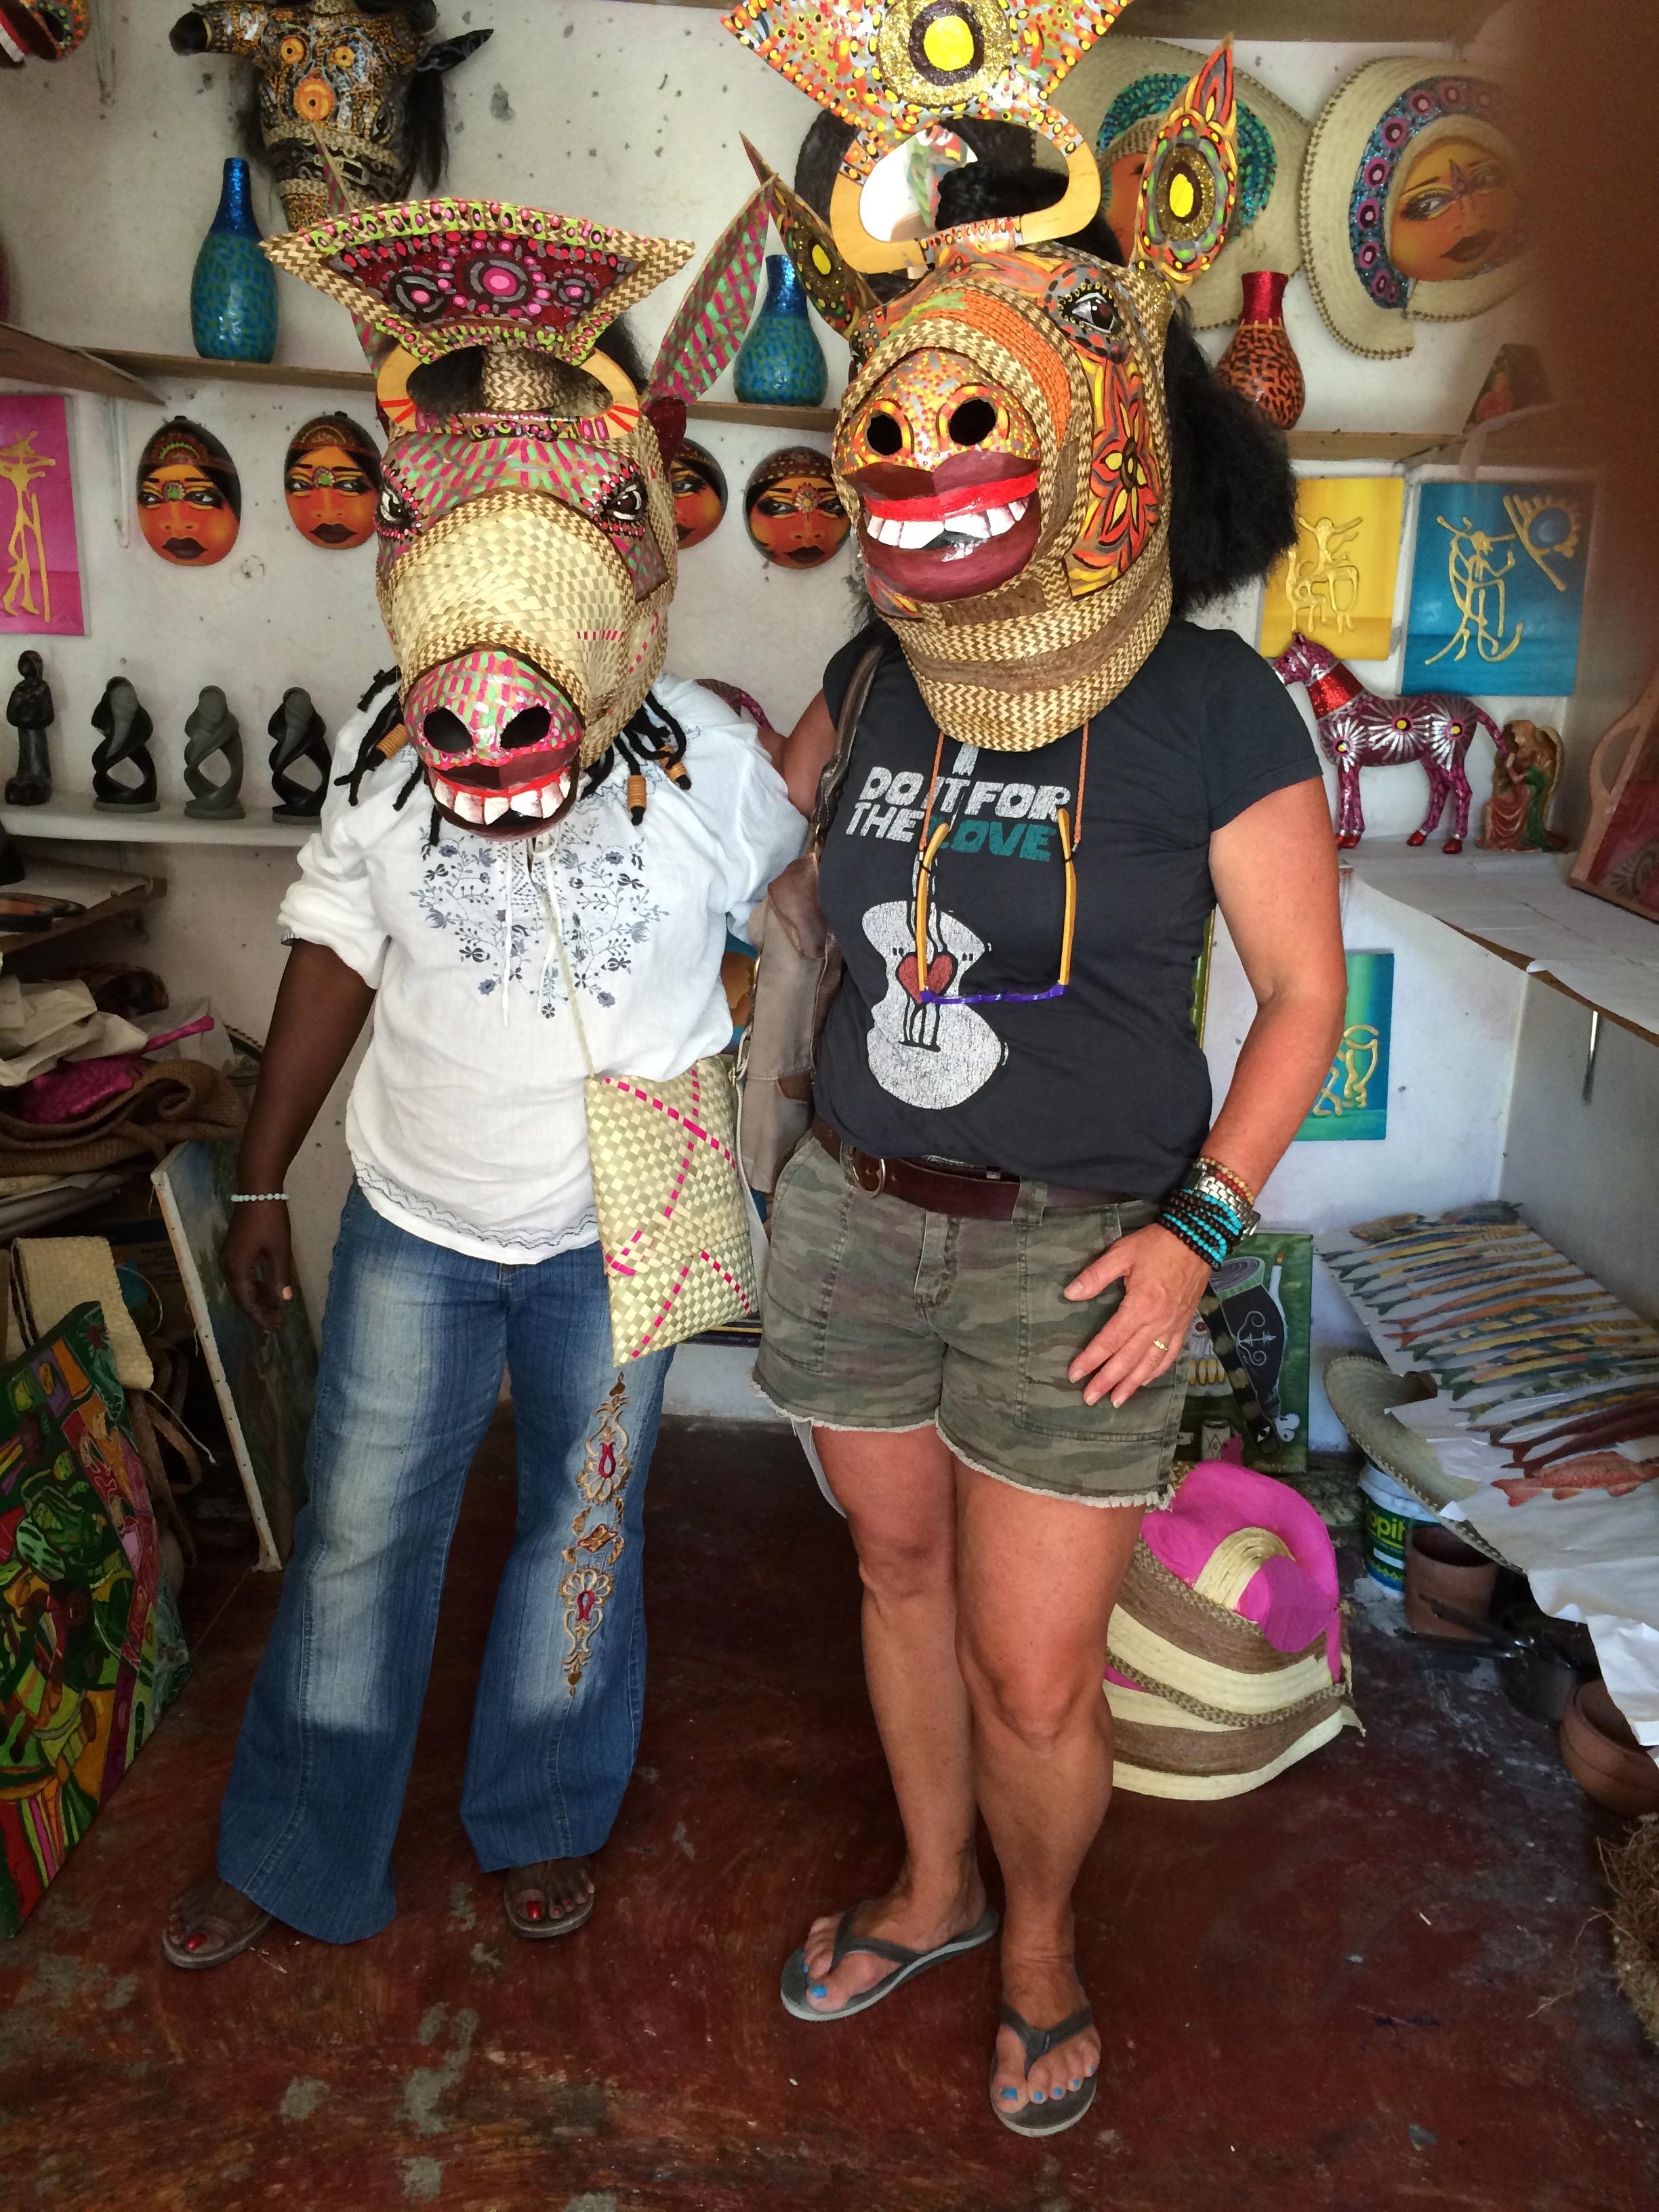 Marilyn Haiti charlotte charles mask Jacmel.jpg